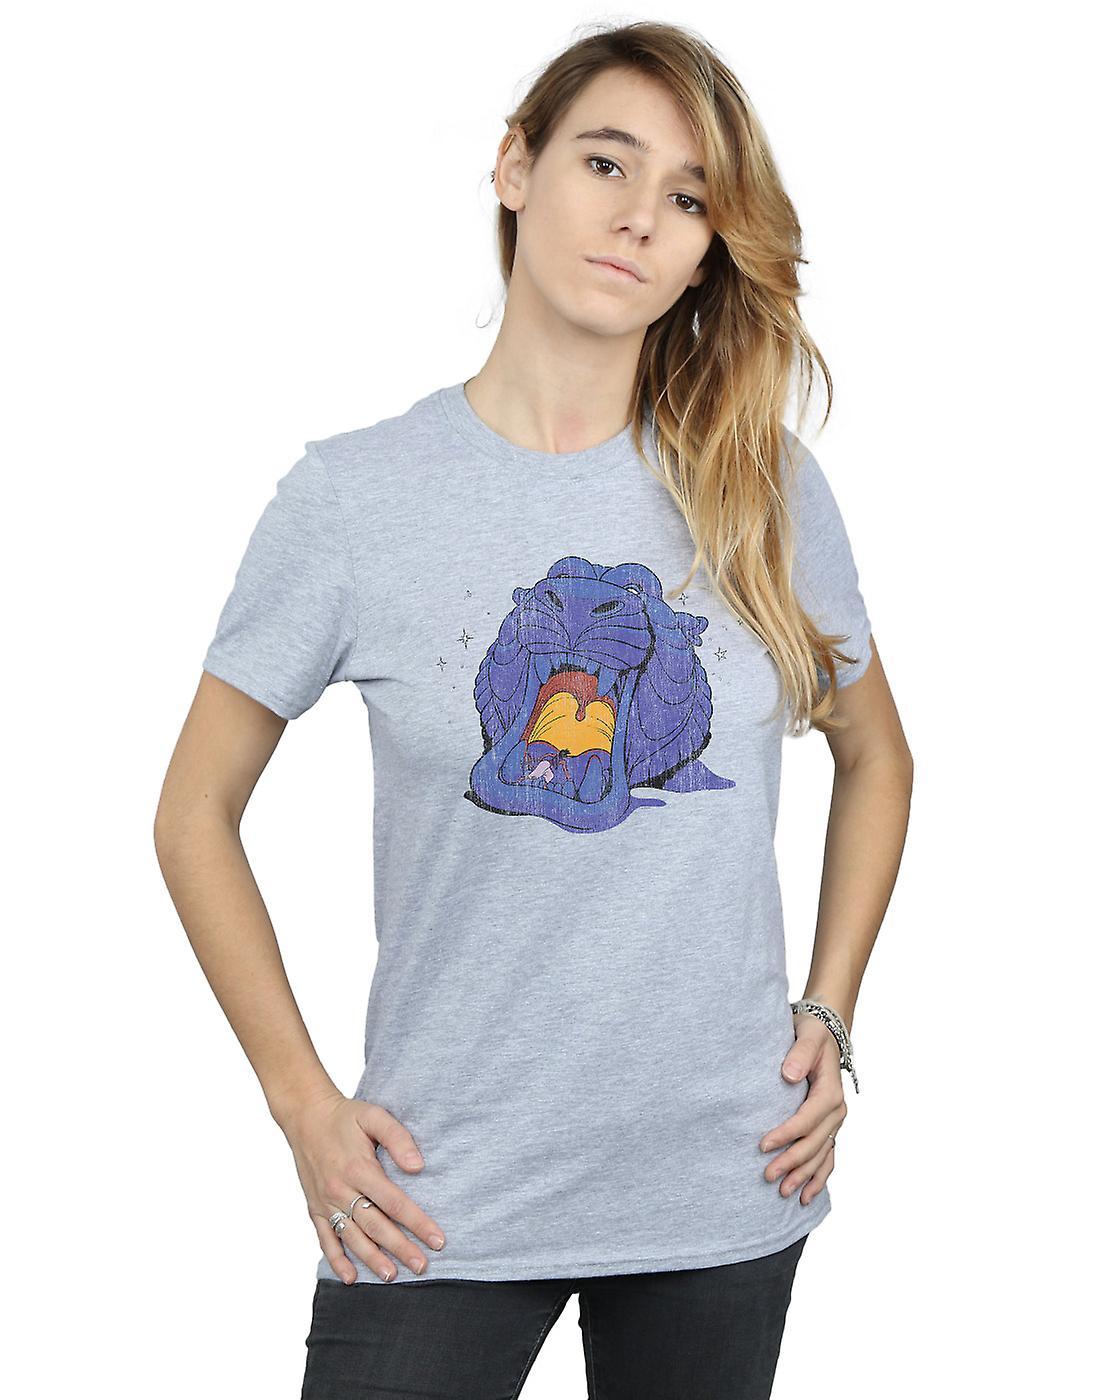 Disney Women's Aladdin Cave Of Wonders Distressed Boyfriend Fit T-Shirt